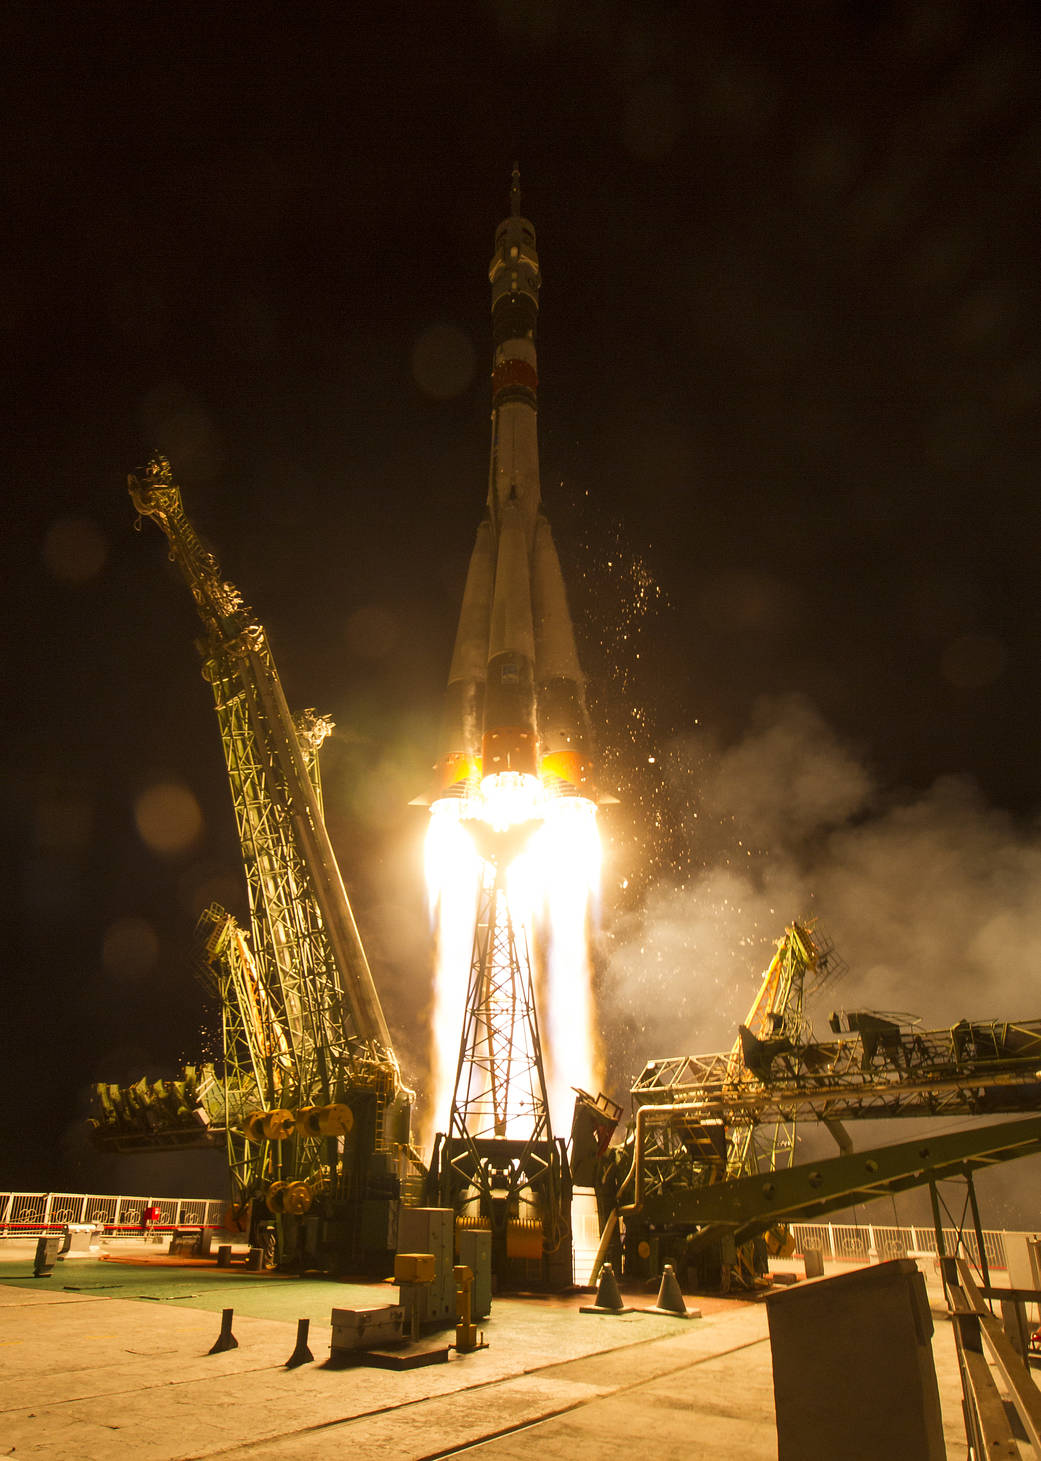 Liftoff of Soyuz rocket from Baikonur Cosmodrome